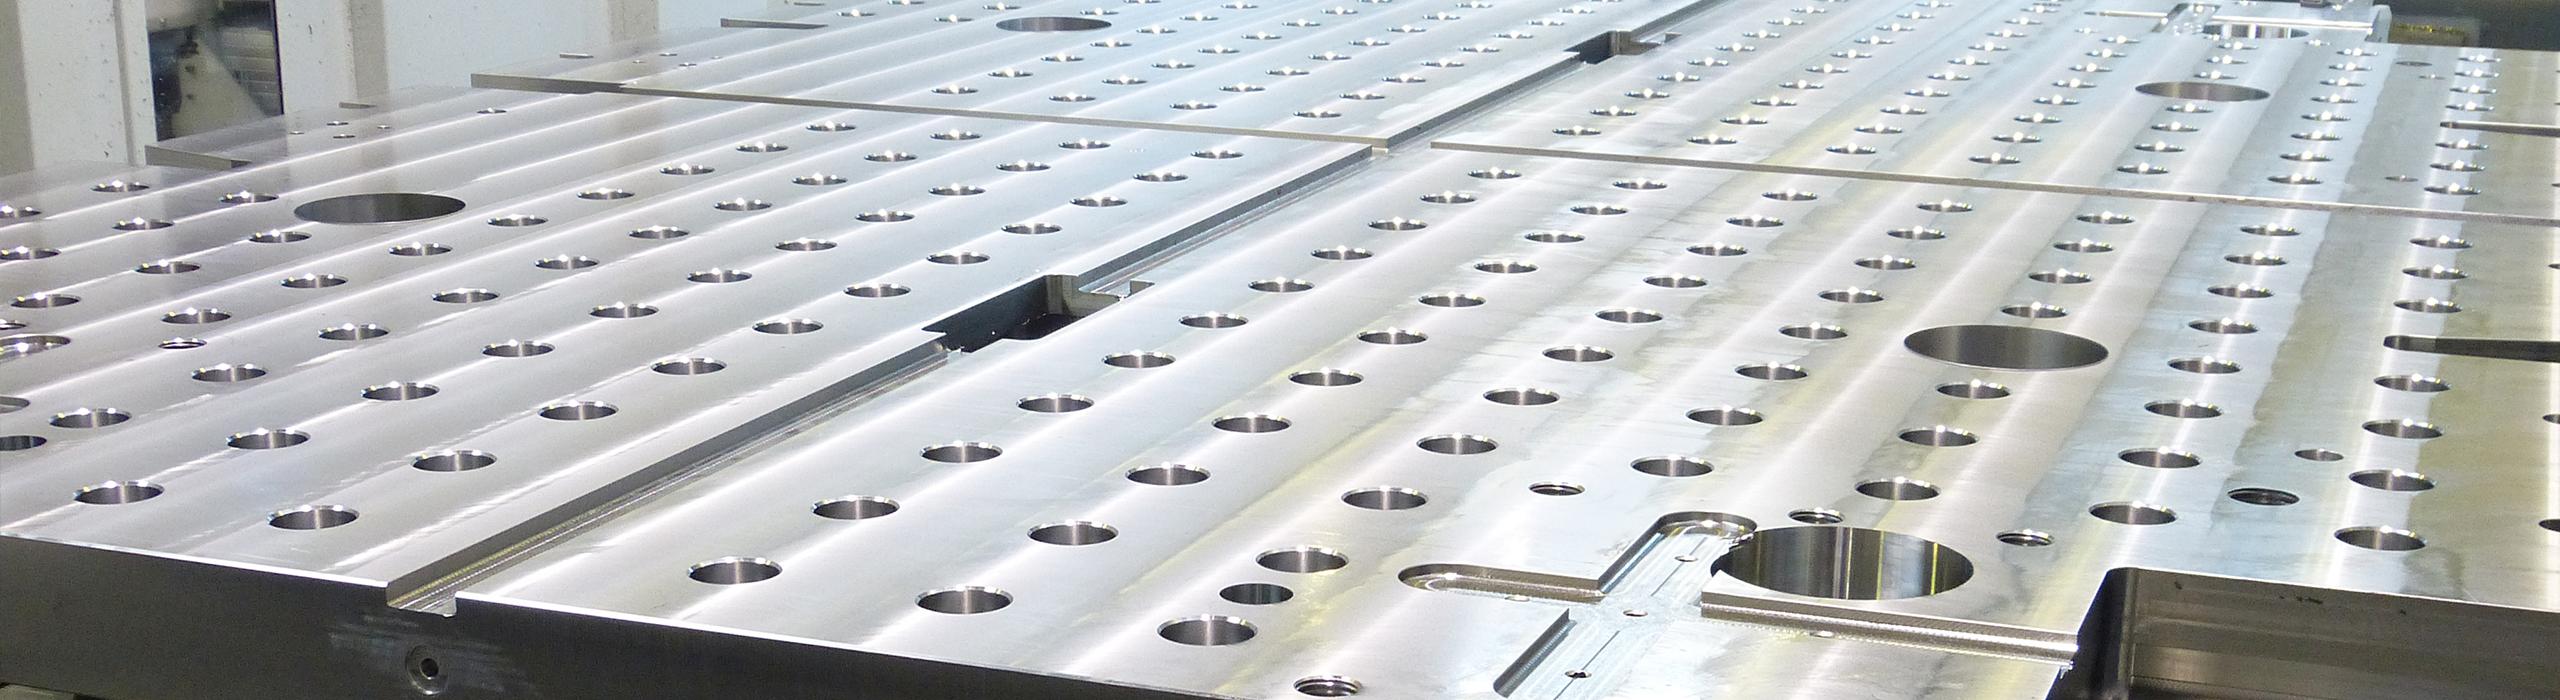 RSB-Stahl-formenbau-header1